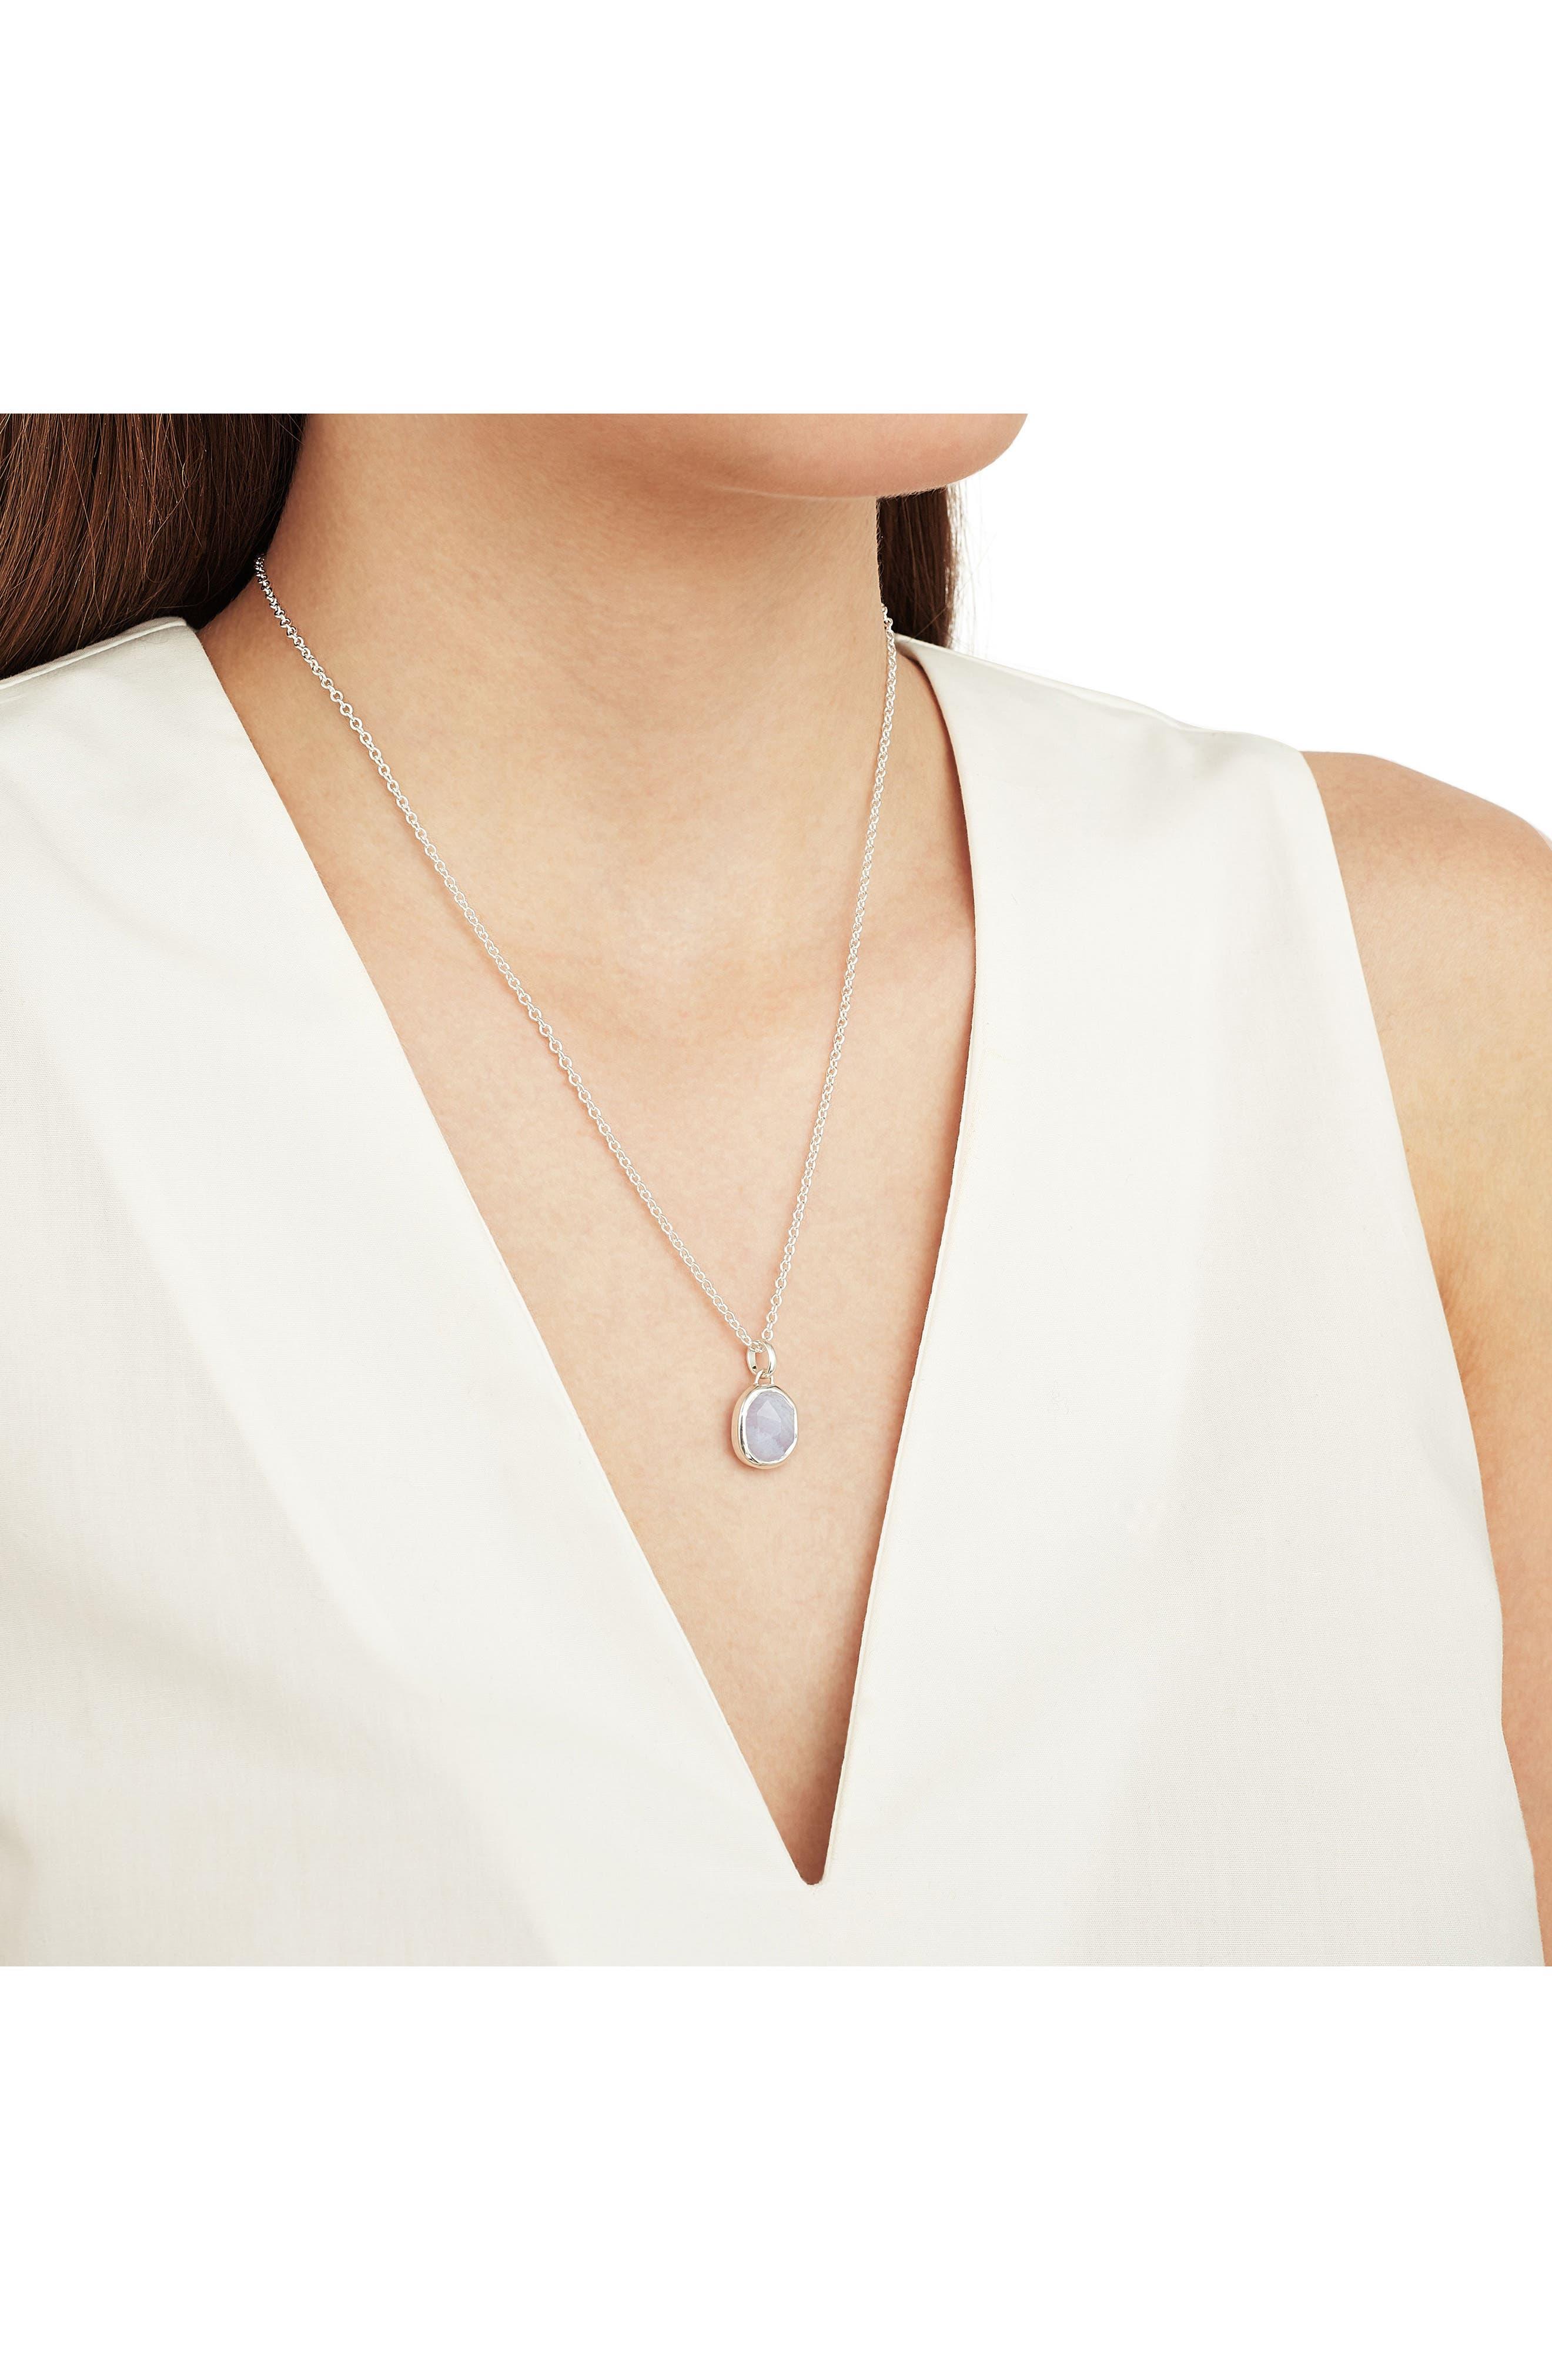 Siren Medium Bezel Pendant,                             Alternate thumbnail 2, color,                             Silver/ Blue Lace Agate